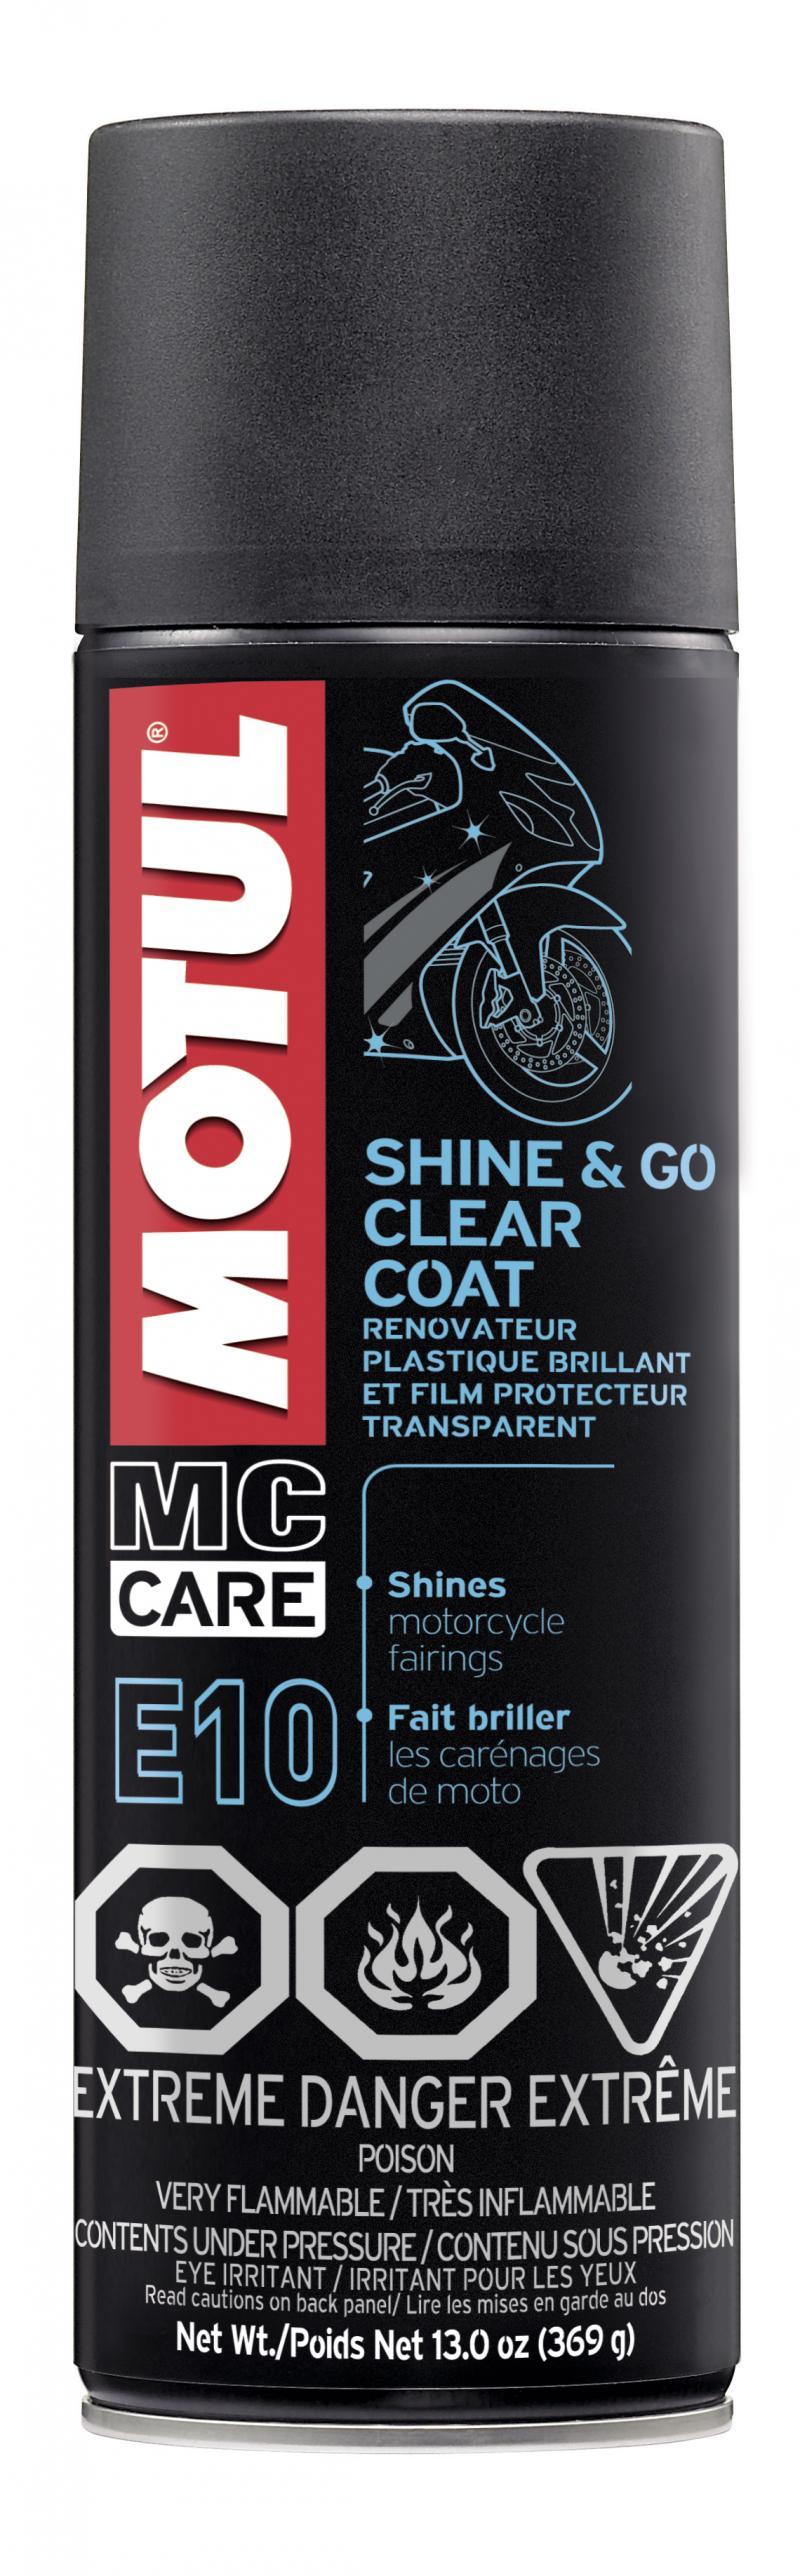 Motul E10 SHINE & GO - 0.550L  - Car Maintenance